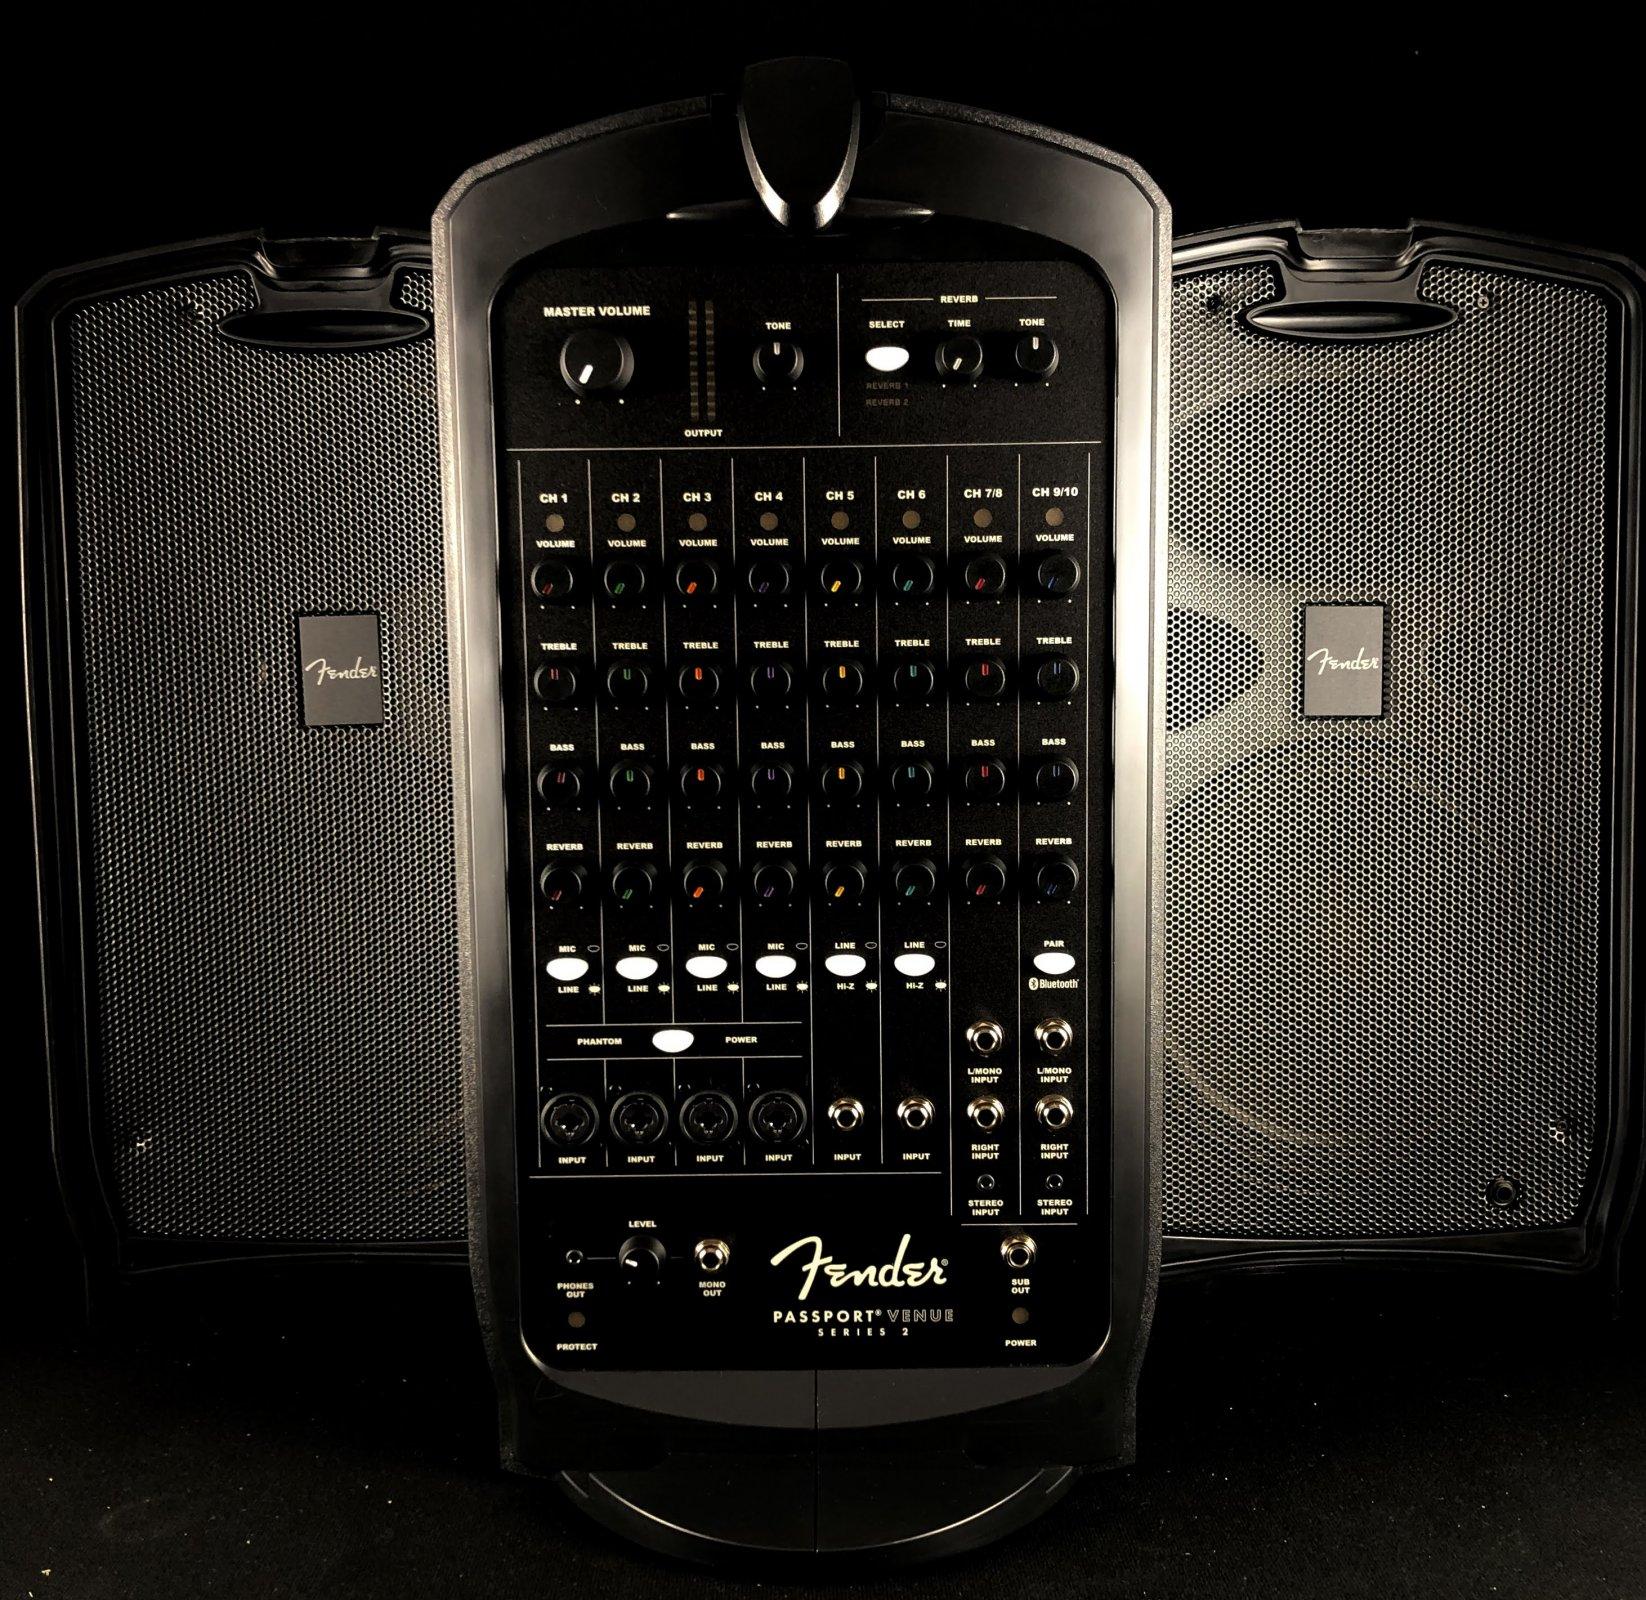 Fender Passport Venue Series 2